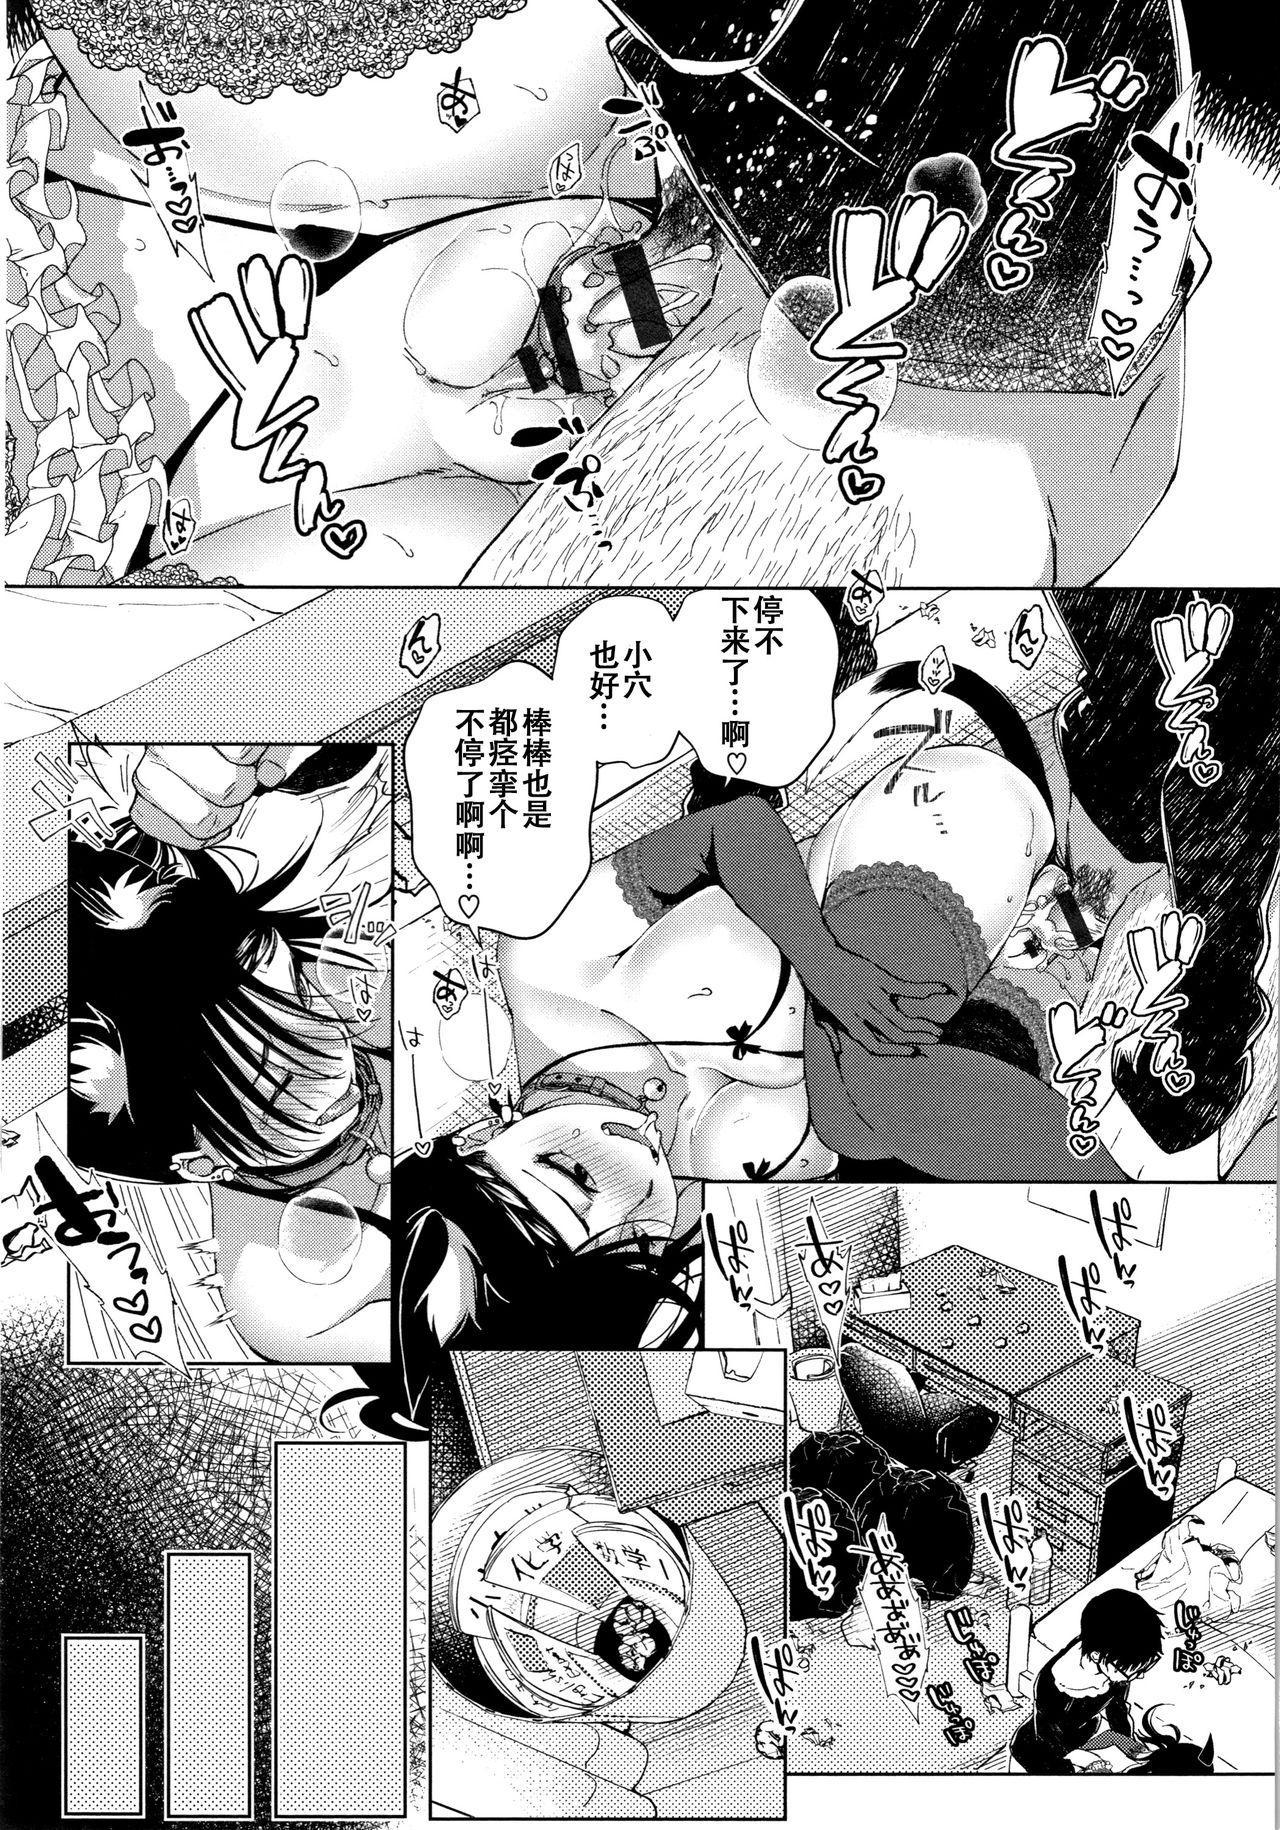 [Achumuchi] Saijaku Gal wa Ikizurai! - The weakest pussy is hard to go.ch.1-3 [Chinese] [战栗的玻璃棒汉化] [Ongoing] 27